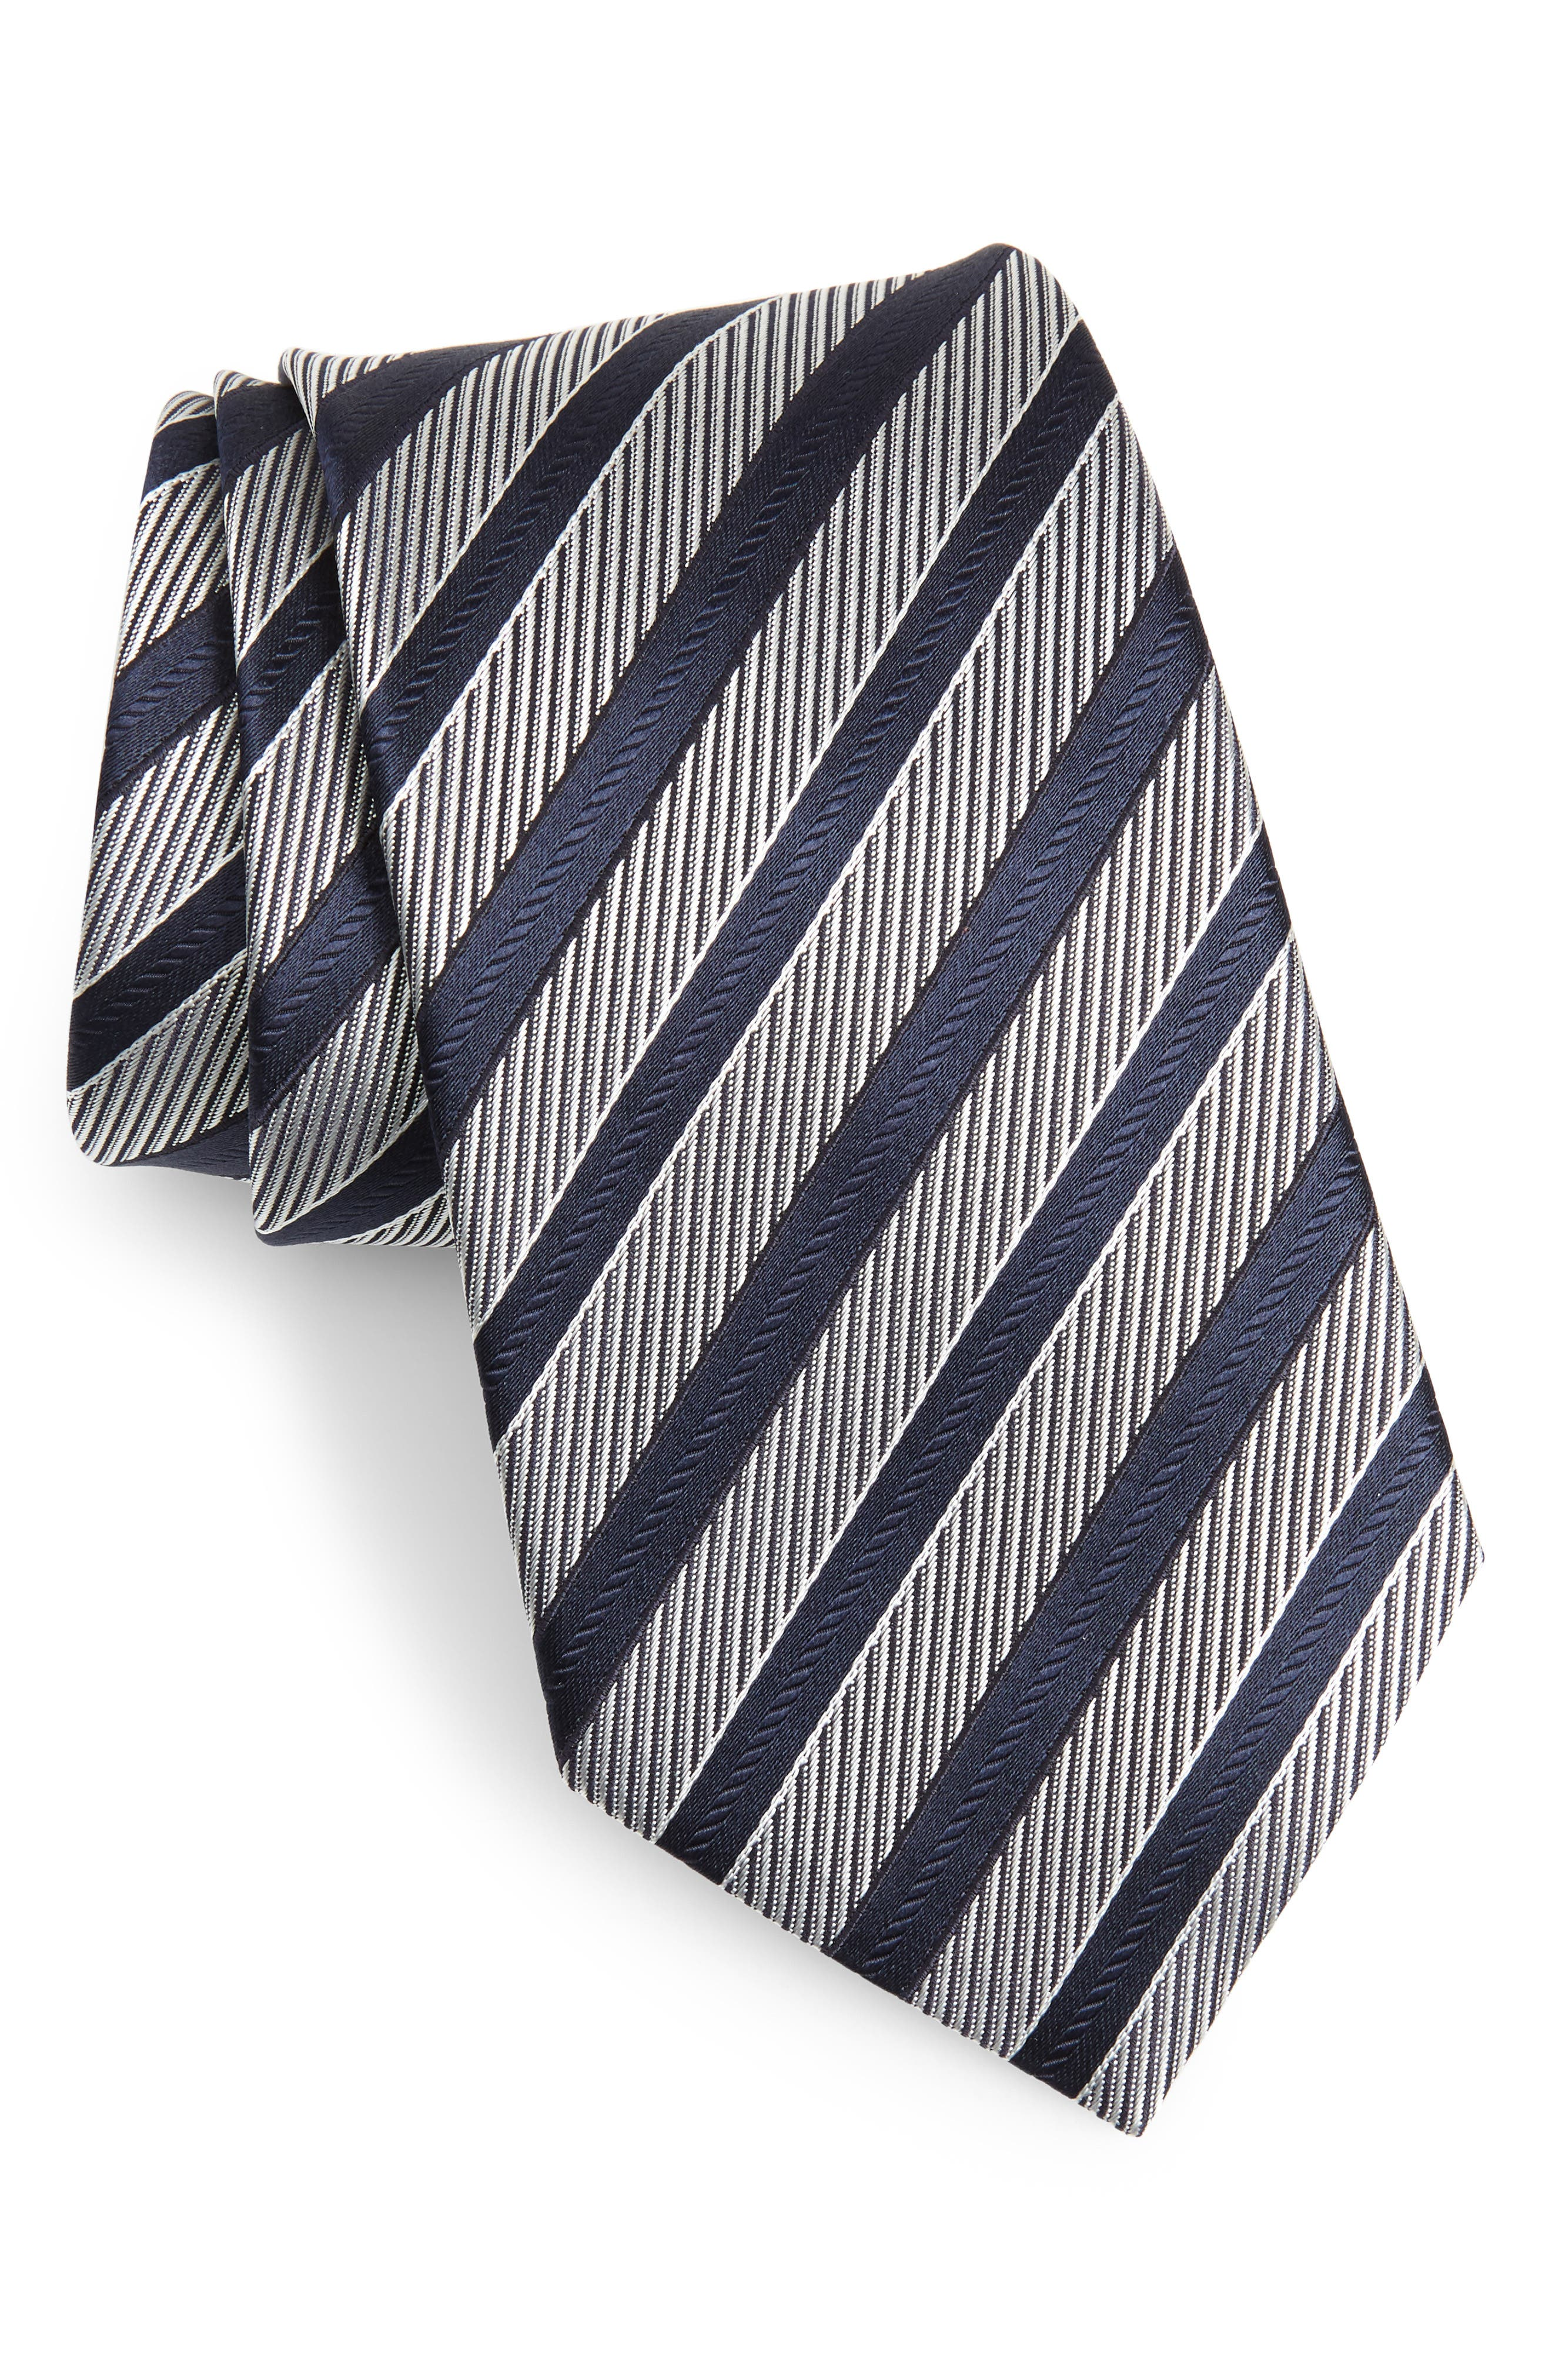 ERMENEGILDO ZEGNA, Stripe Silk Tie, Main thumbnail 1, color, NAVY/ SILVER